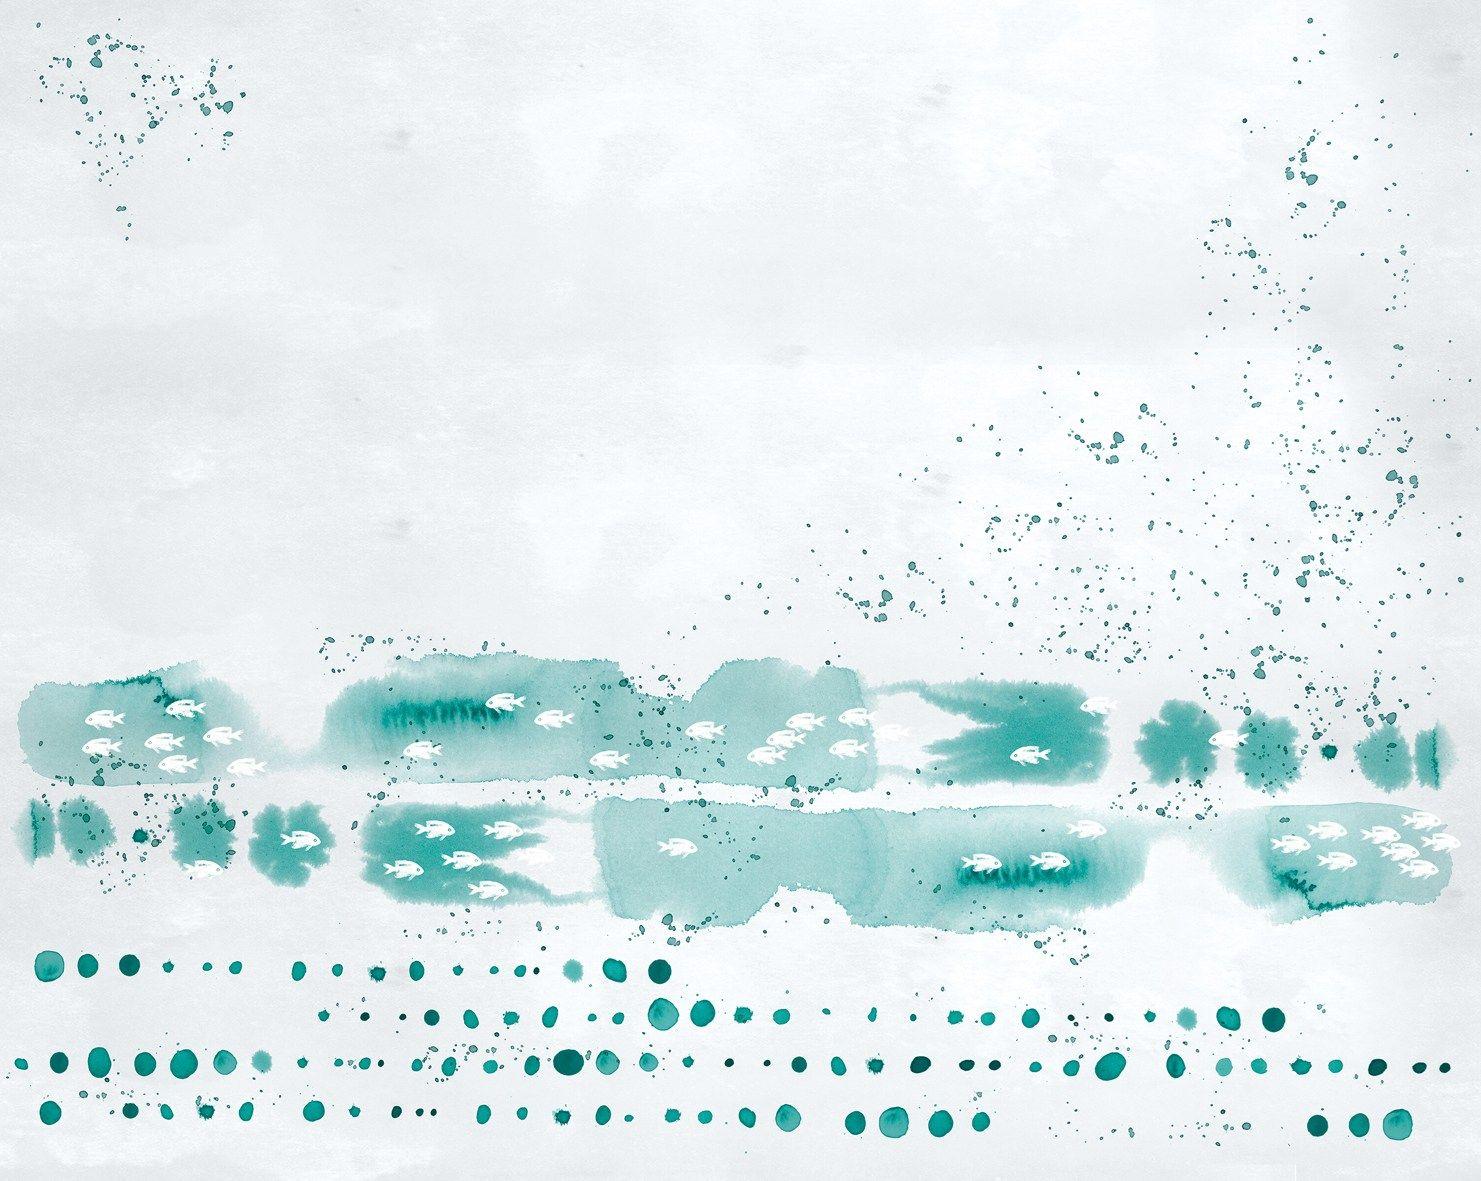 motif wallpaper ocean drops wet system 15 collection by. Black Bedroom Furniture Sets. Home Design Ideas